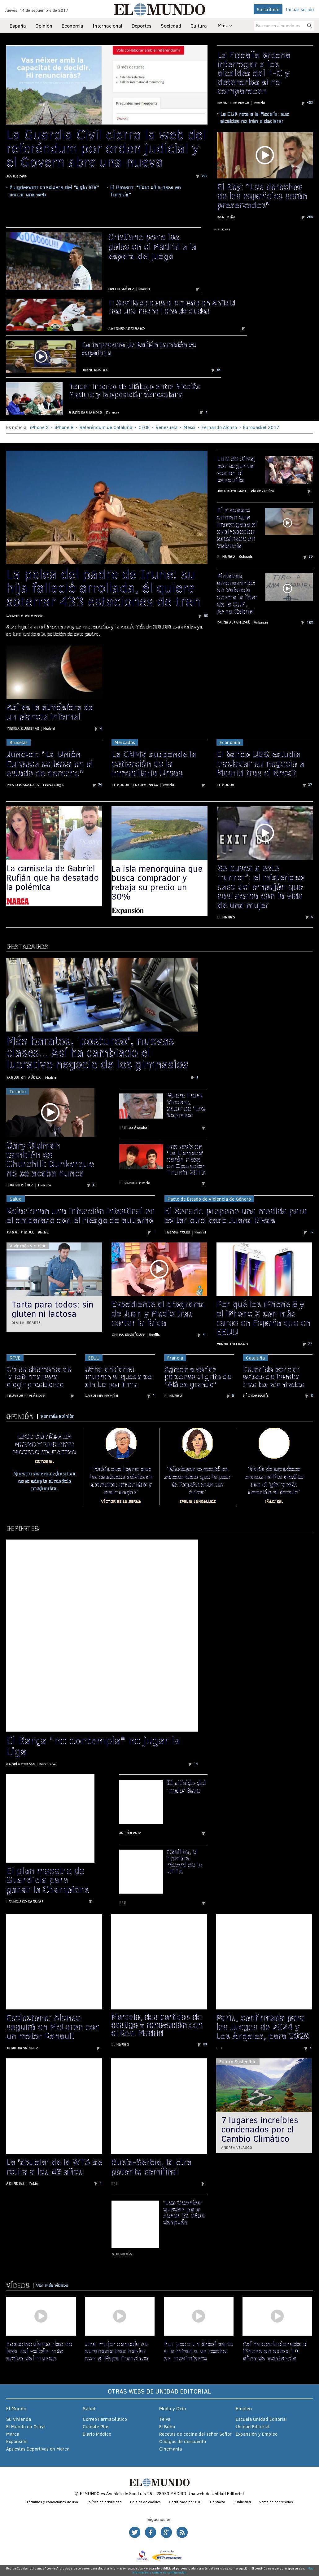 El Mundo at Wednesday Sept. 13, 2017, 10:10 p.m. UTC